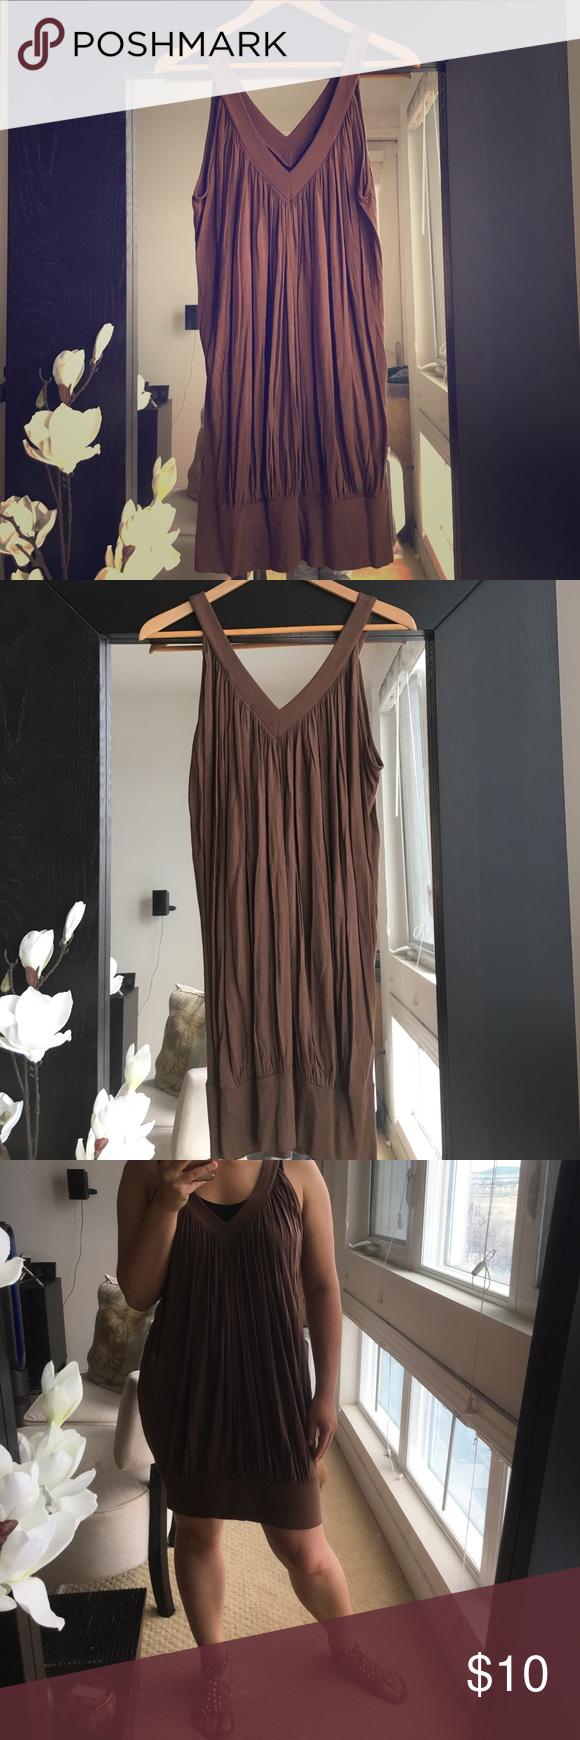 BCBGMAXAZRIA Banded Dress Tank banded bottom dress with pleating. Good condition. BCBGMaxAzria Dresses Mini